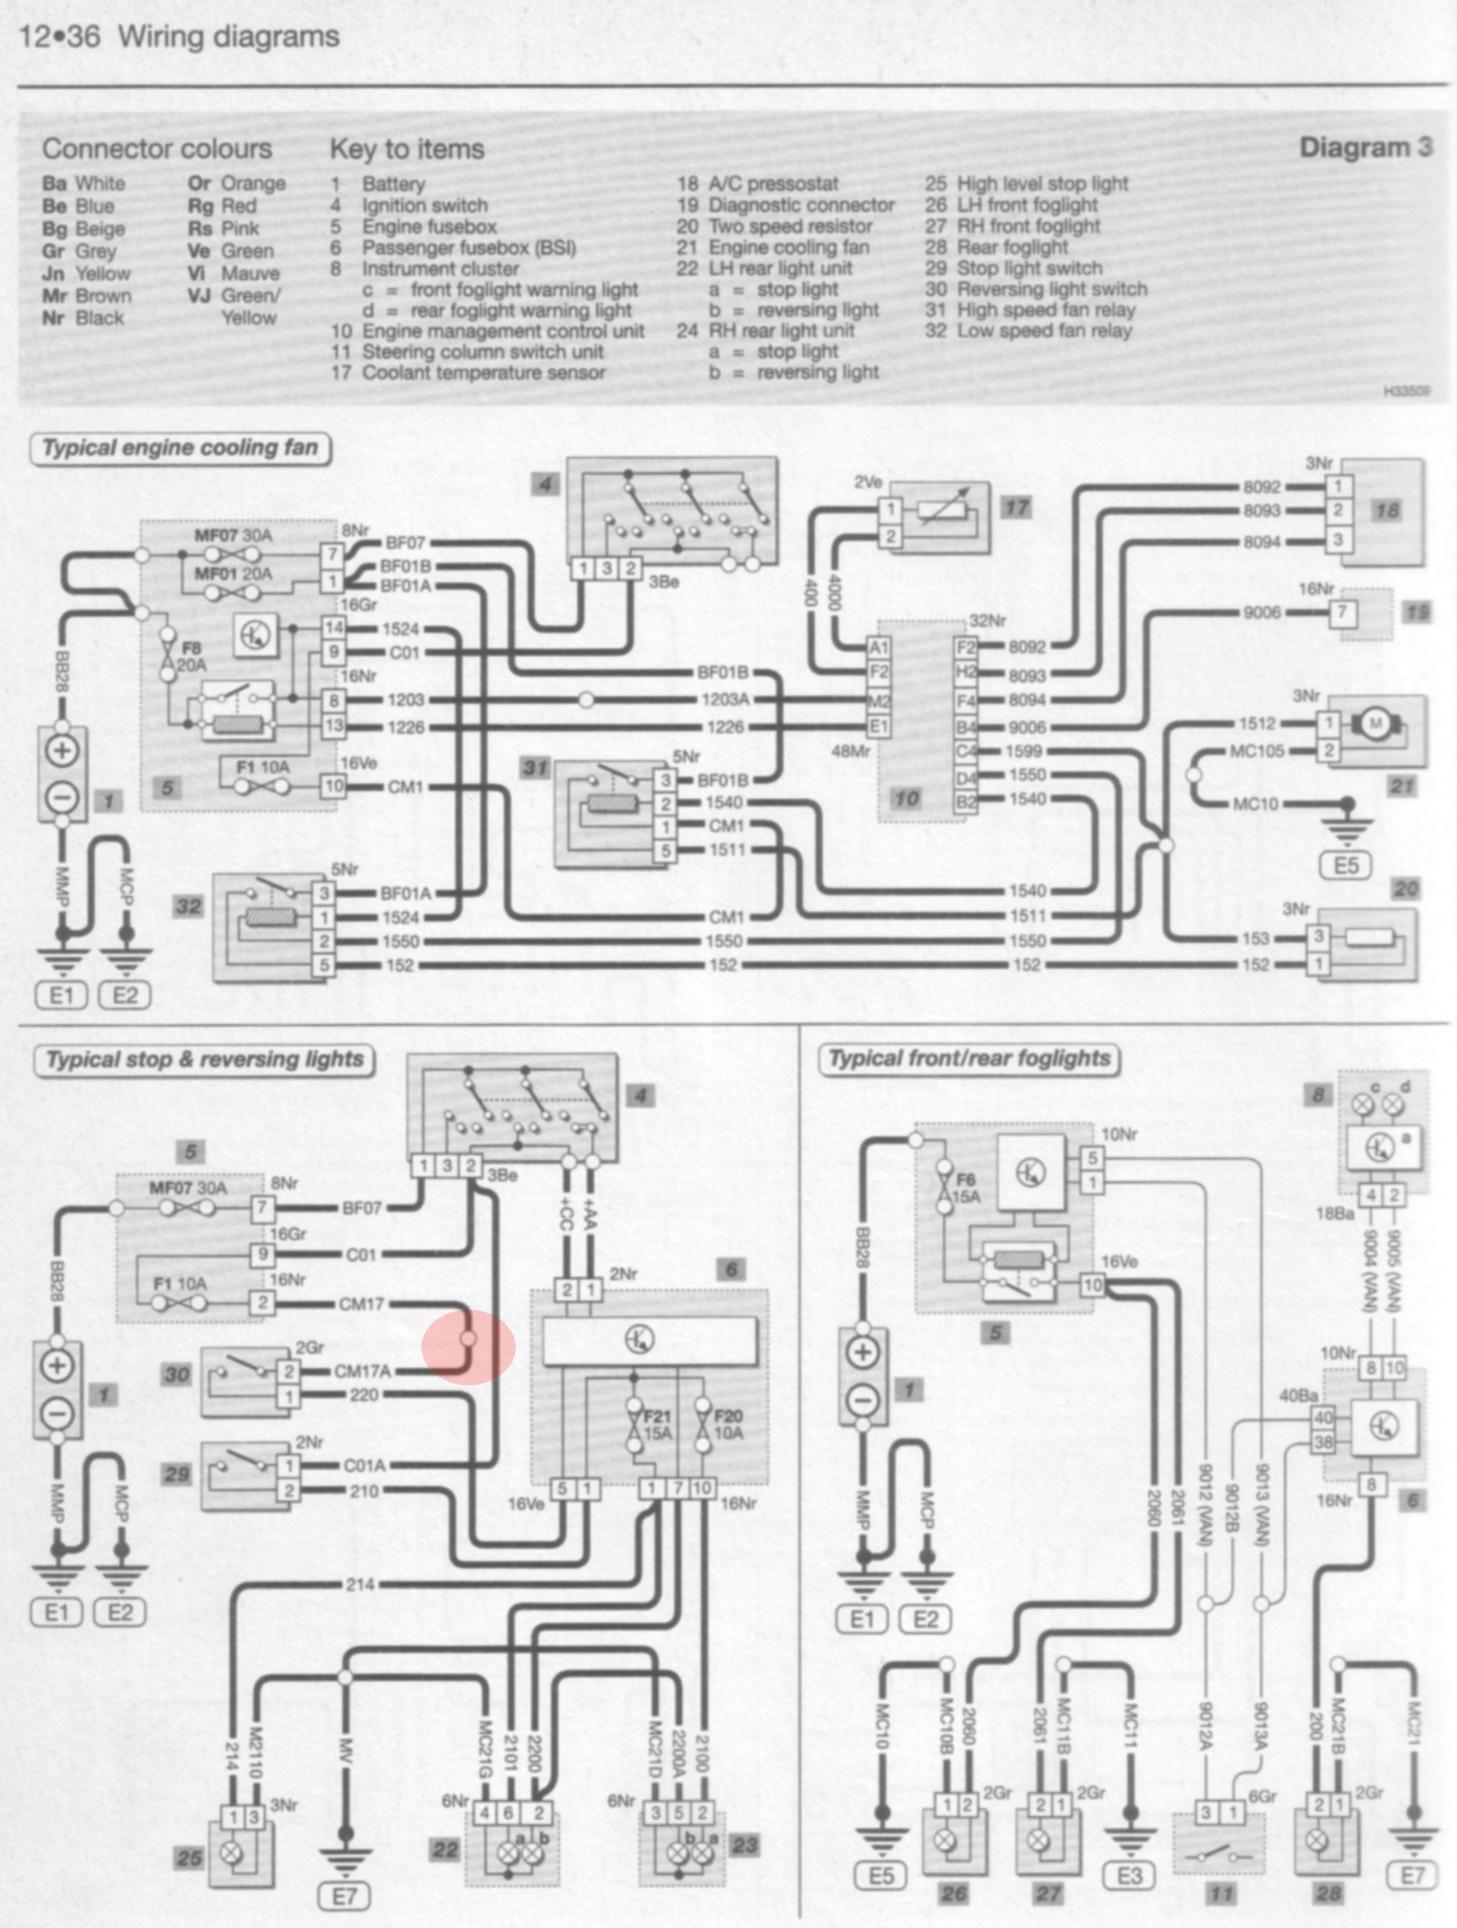 Outstanding Peugeot Wiring Diagrams Basic Electronics Wiring Diagram Wiring Cloud Ittabpendurdonanfuldomelitekicepsianuembamohammedshrineorg